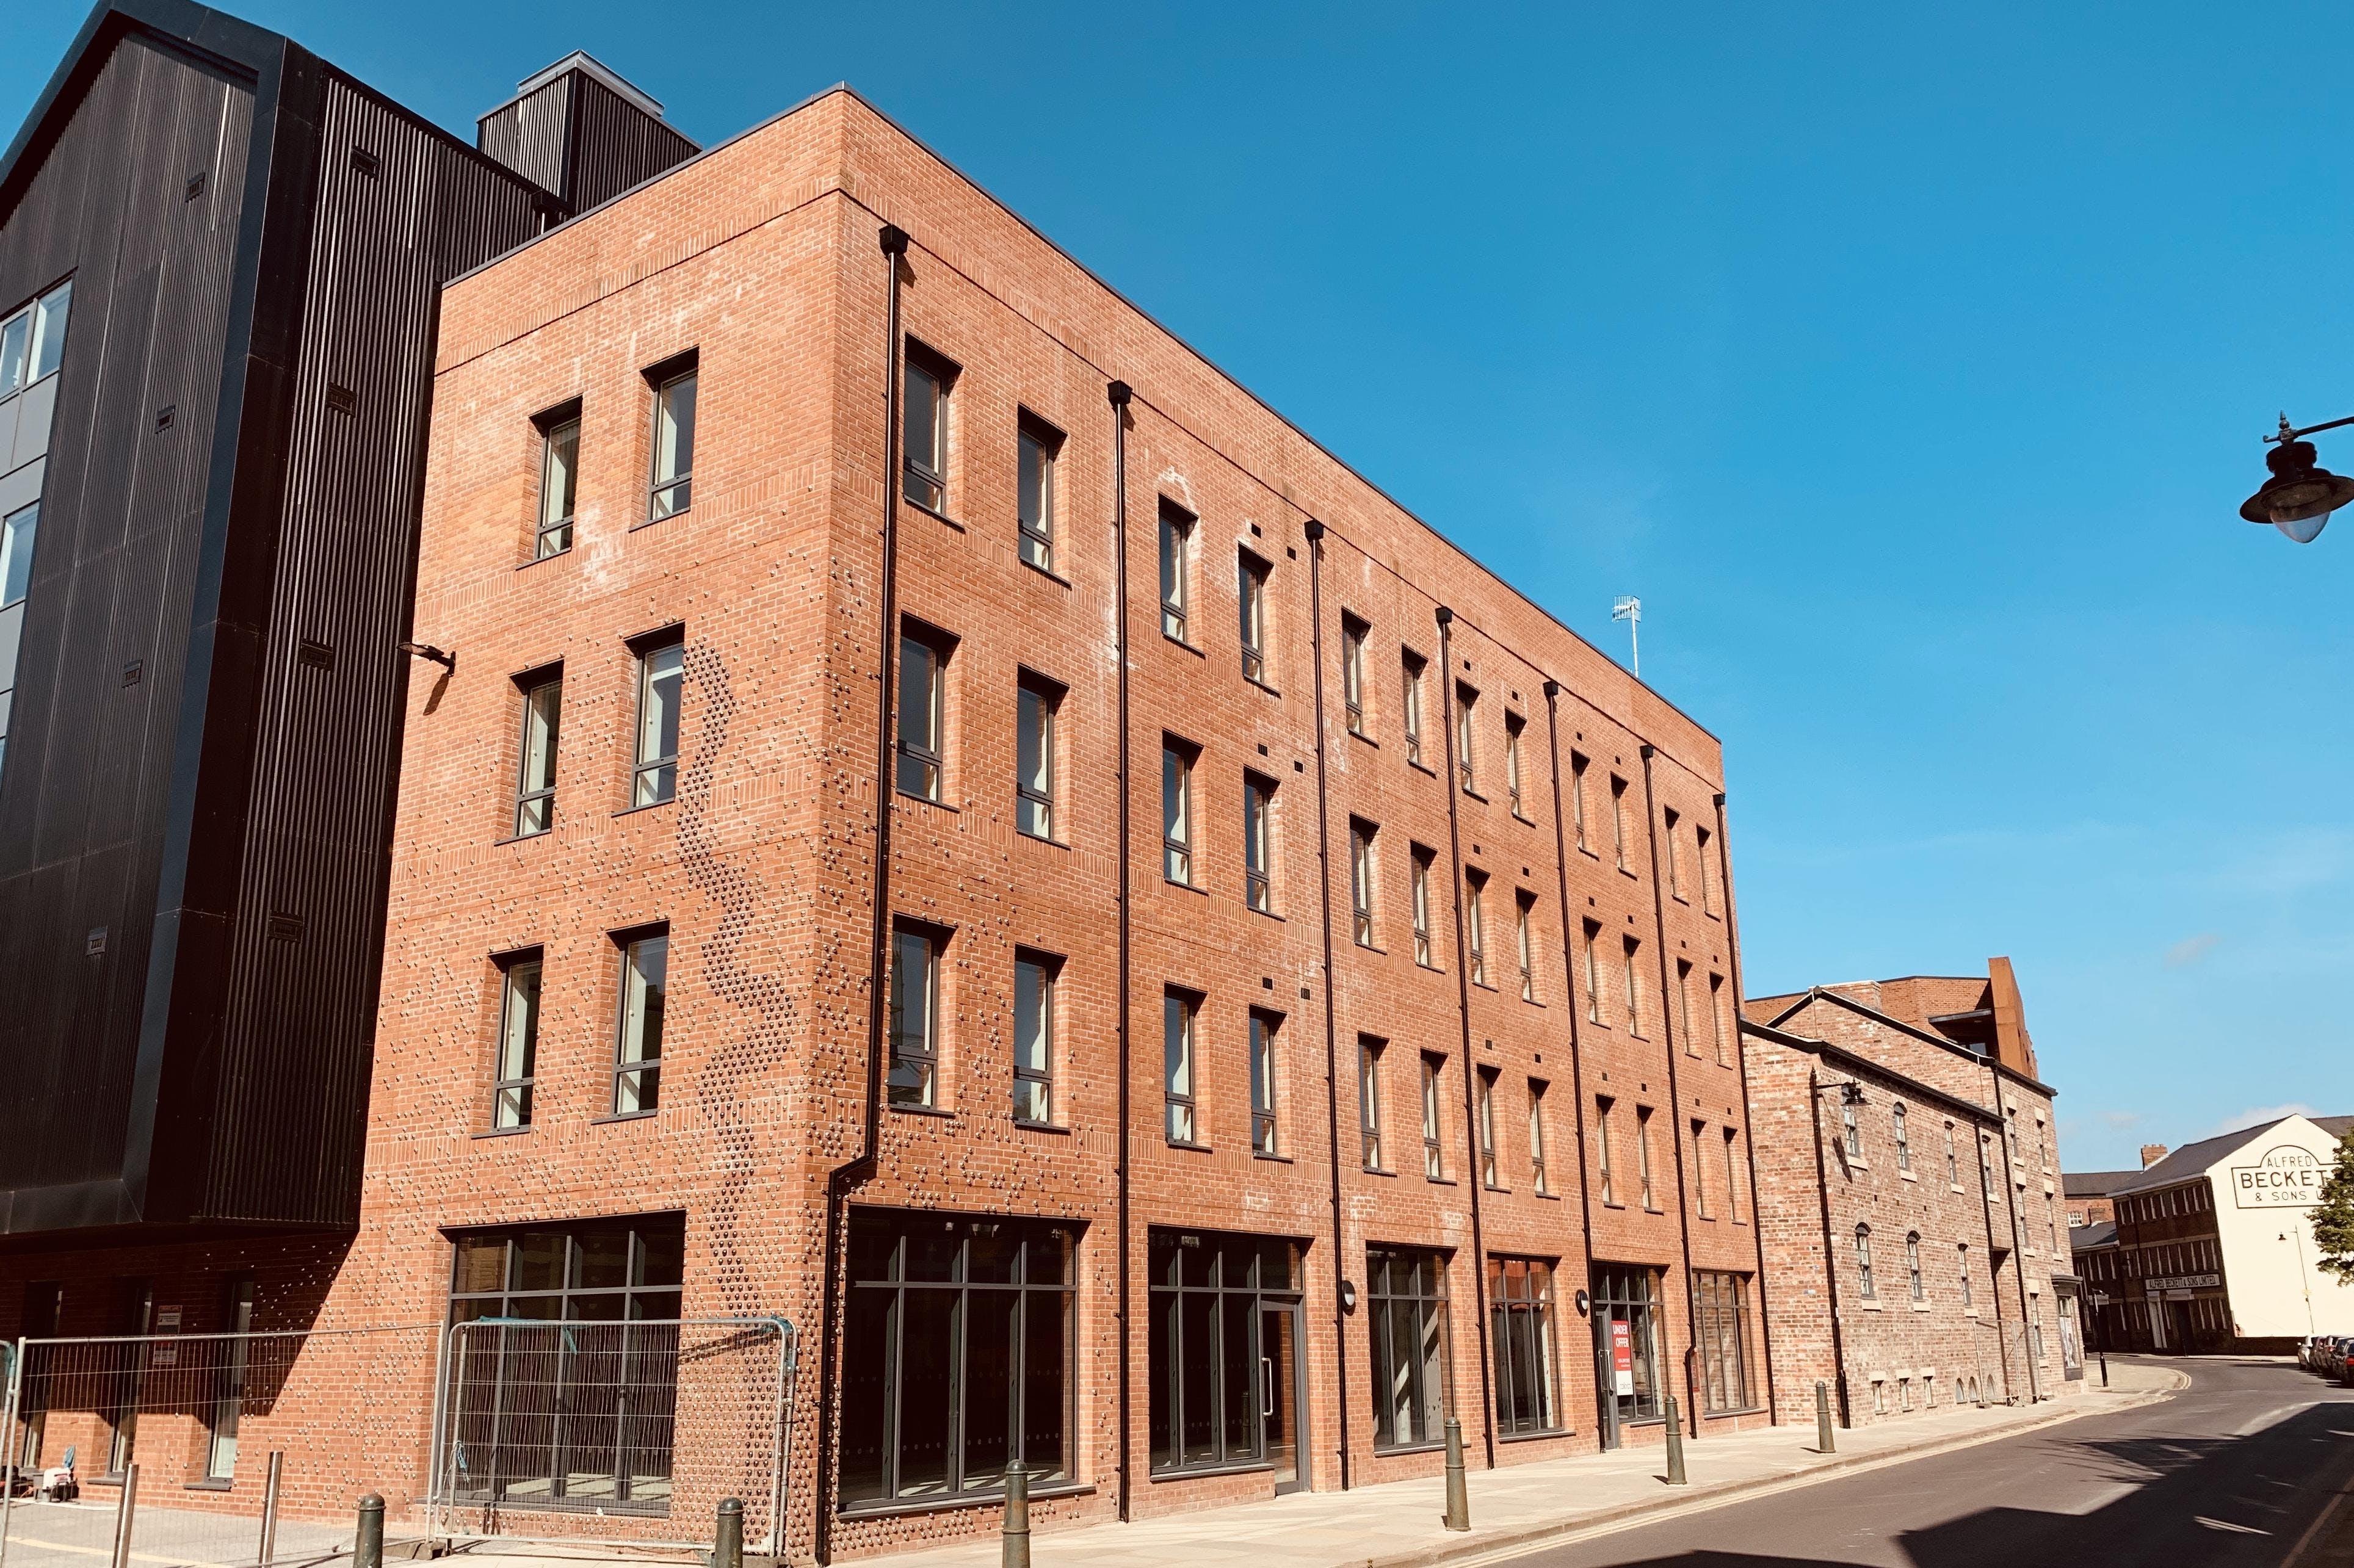 Dun Works, Green Lane, Sheffield, Offices For Sale - Dun - Summer 3.JPG